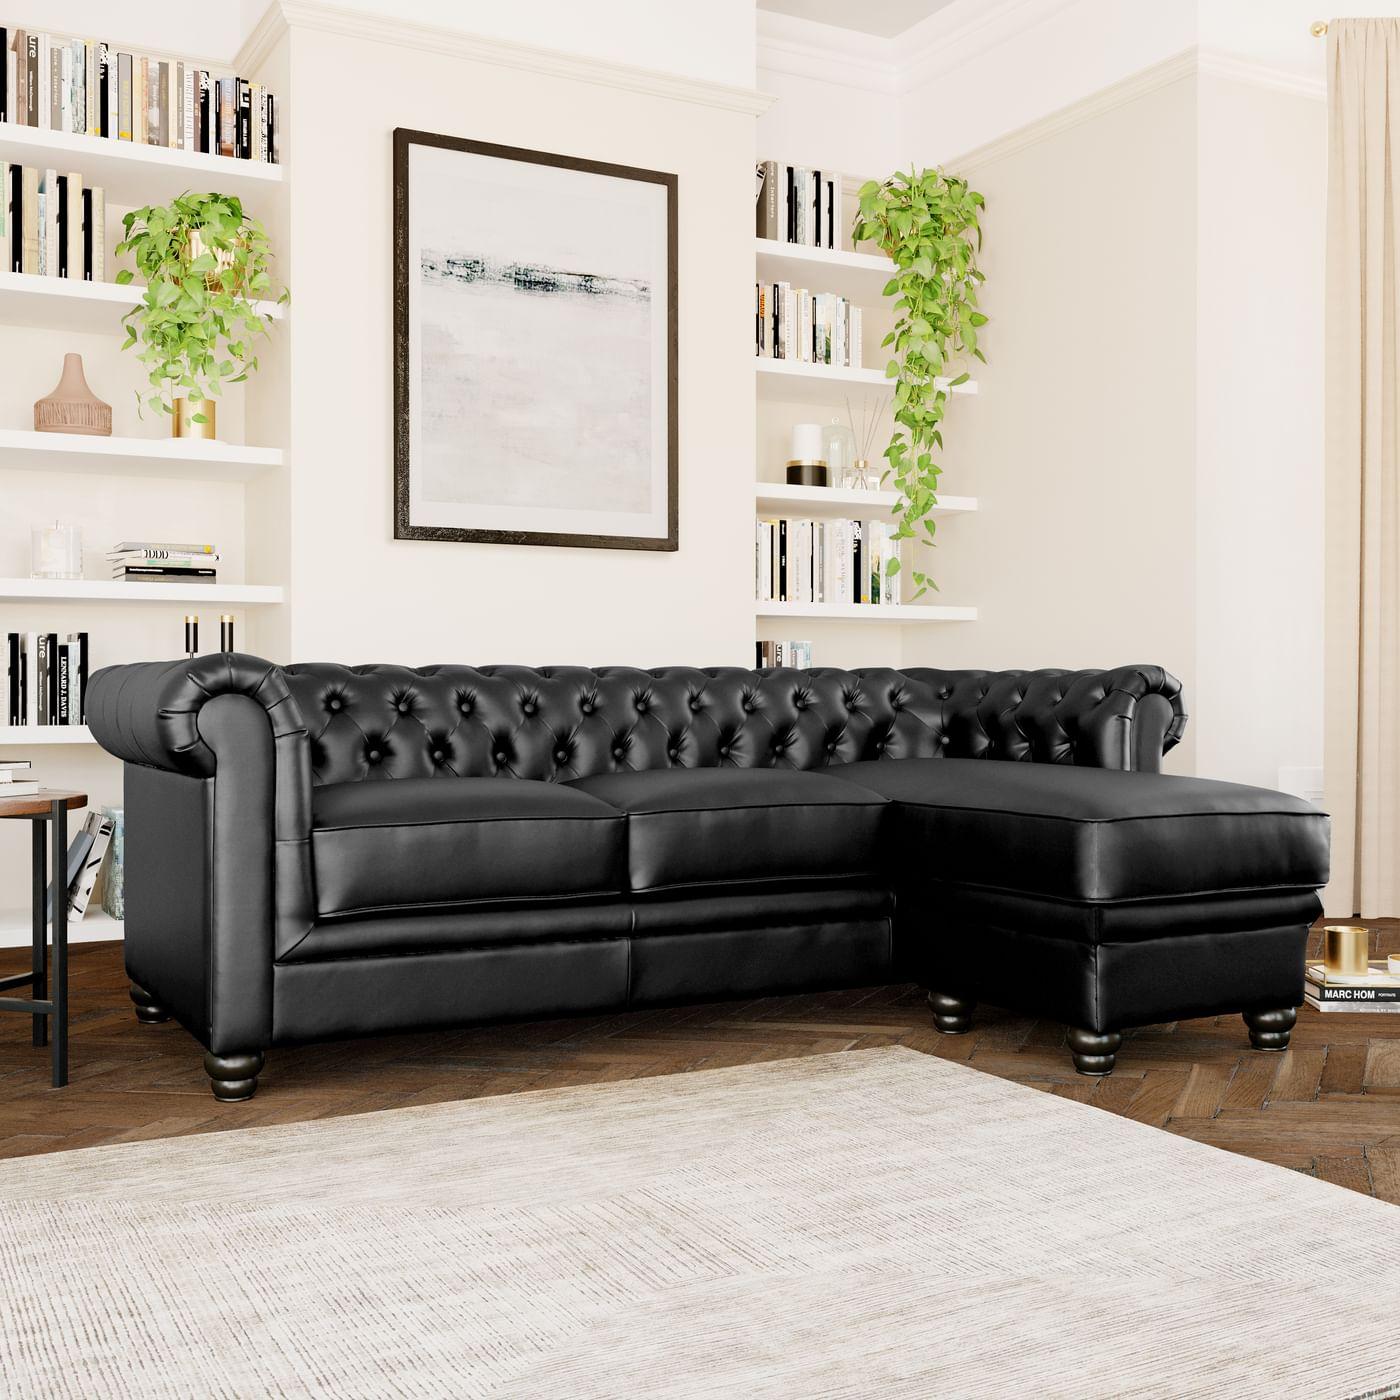 Hampton Chesterfield Black Leather Corner Sofa L Shape